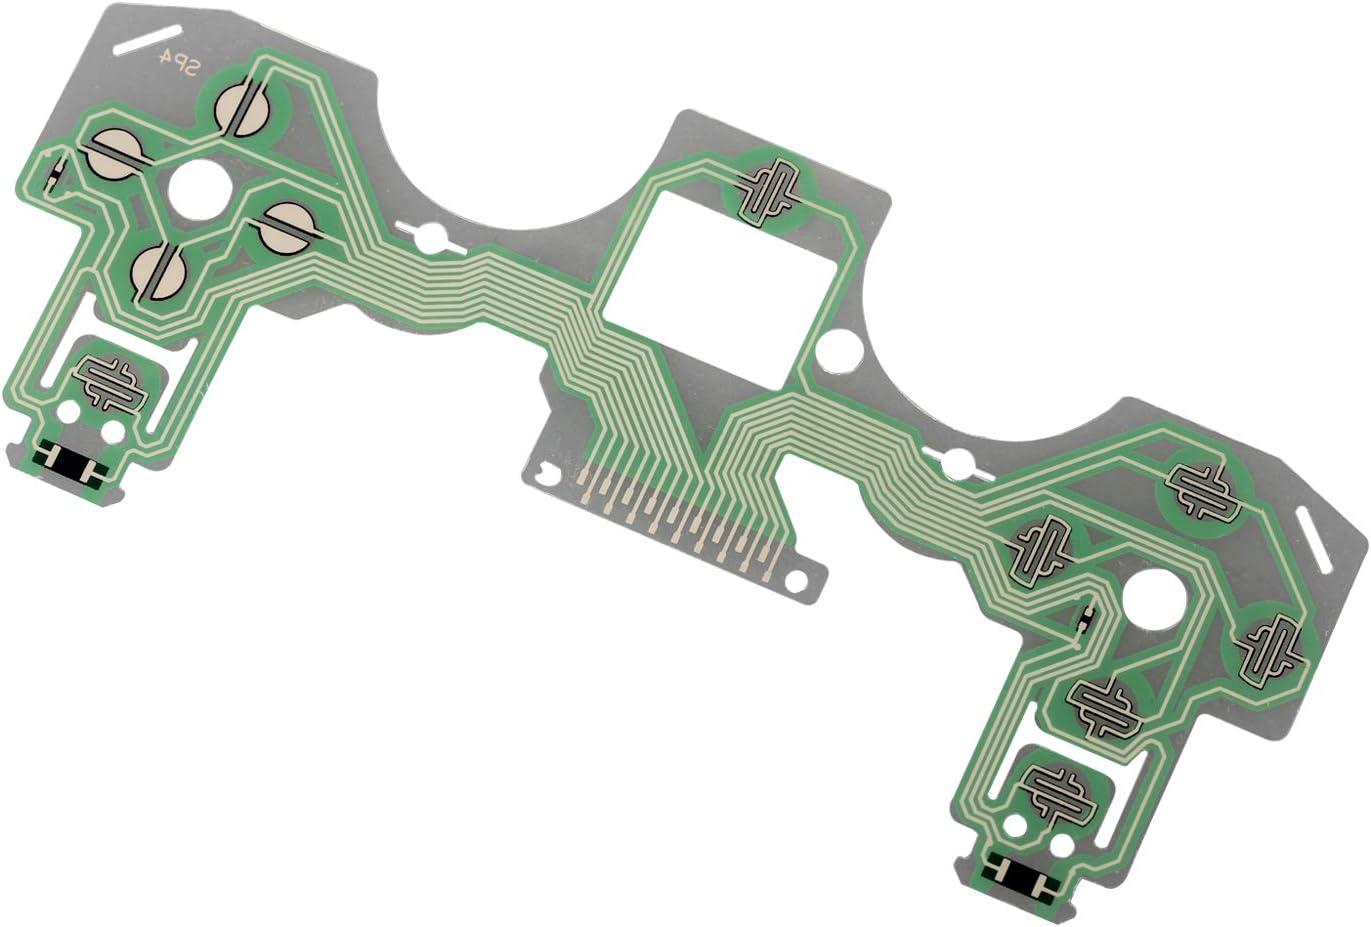 Timorn Teclado PS4, Placa de Circuito de Cinta Flexible de reemplazo para PS4 Placa controladora de Playstation 4 (1 PC)